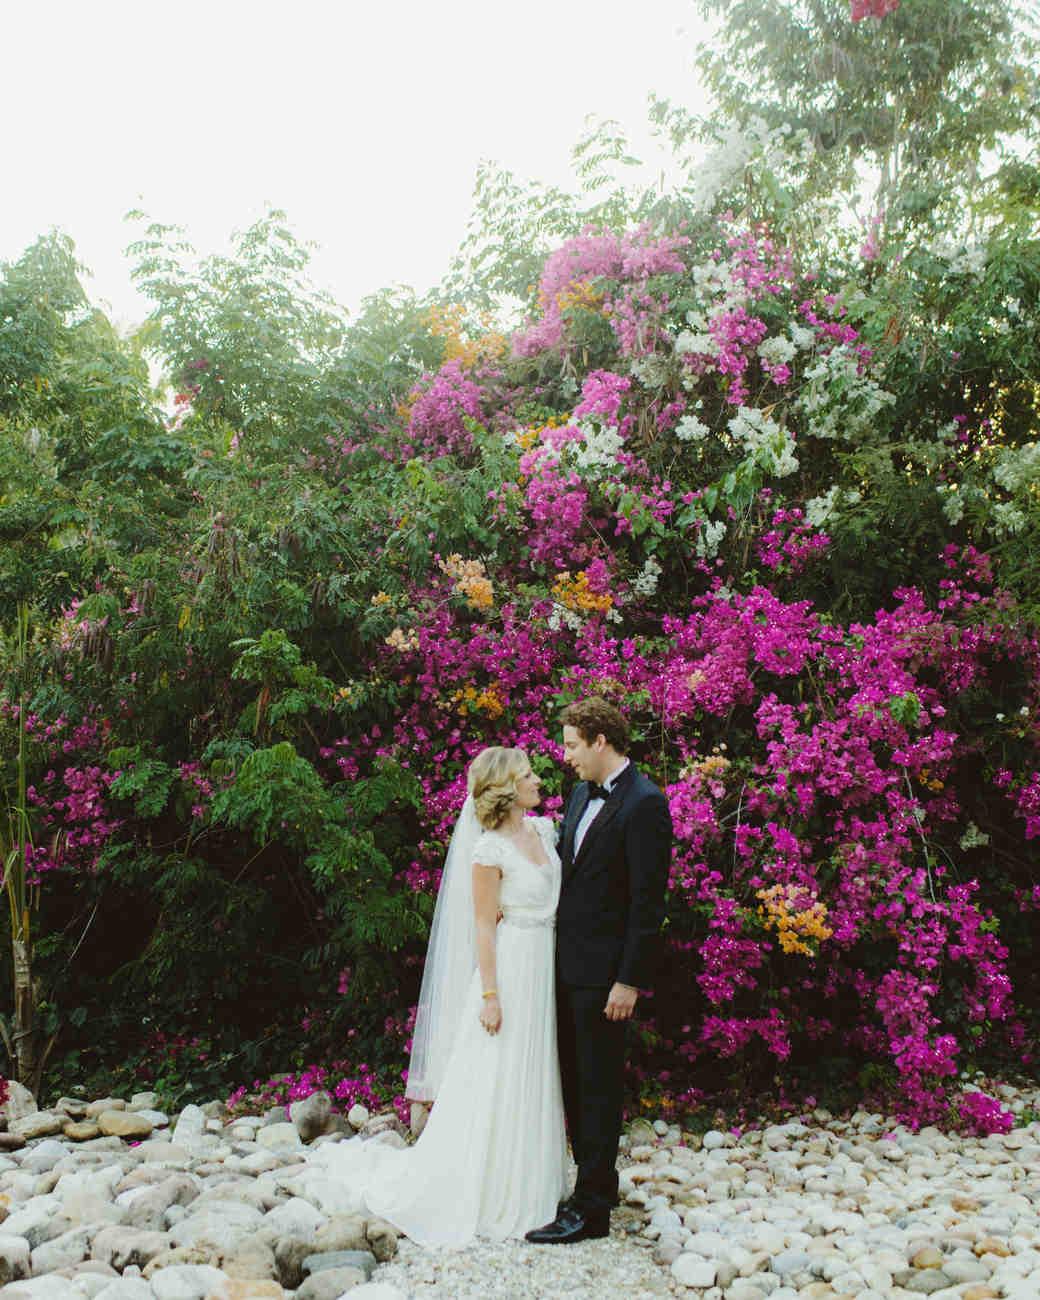 julie-jon-mexico-wedding-0434-s111779.jpg